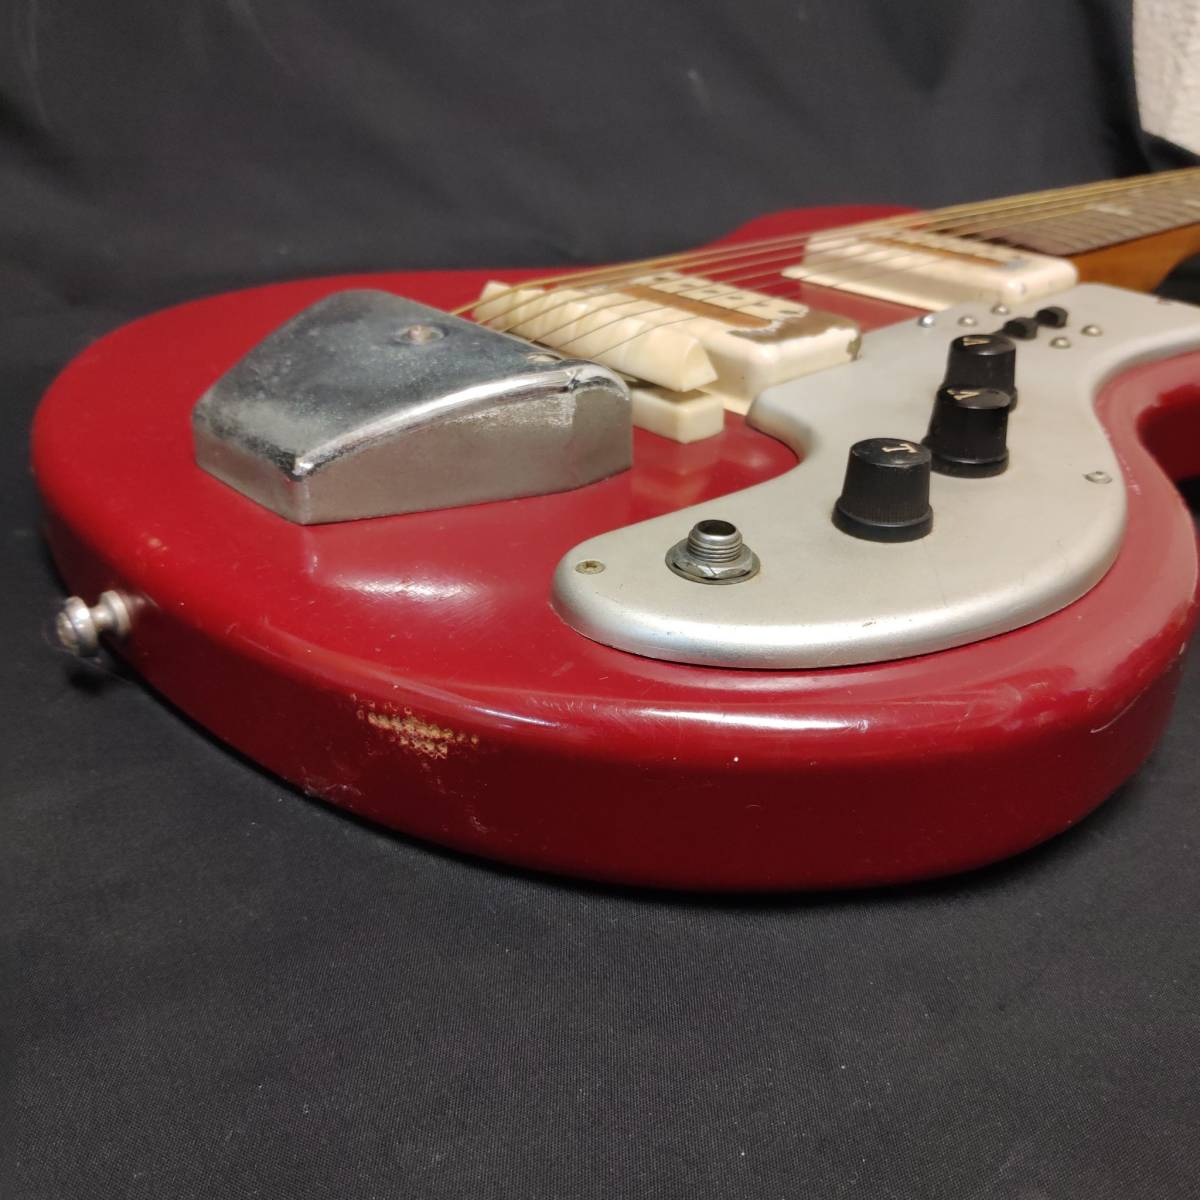 A22m11T GUYA TONE エレキギター LG-85T 本体 約100cm グヤトーン ビンテージ レッド 赤色_画像9